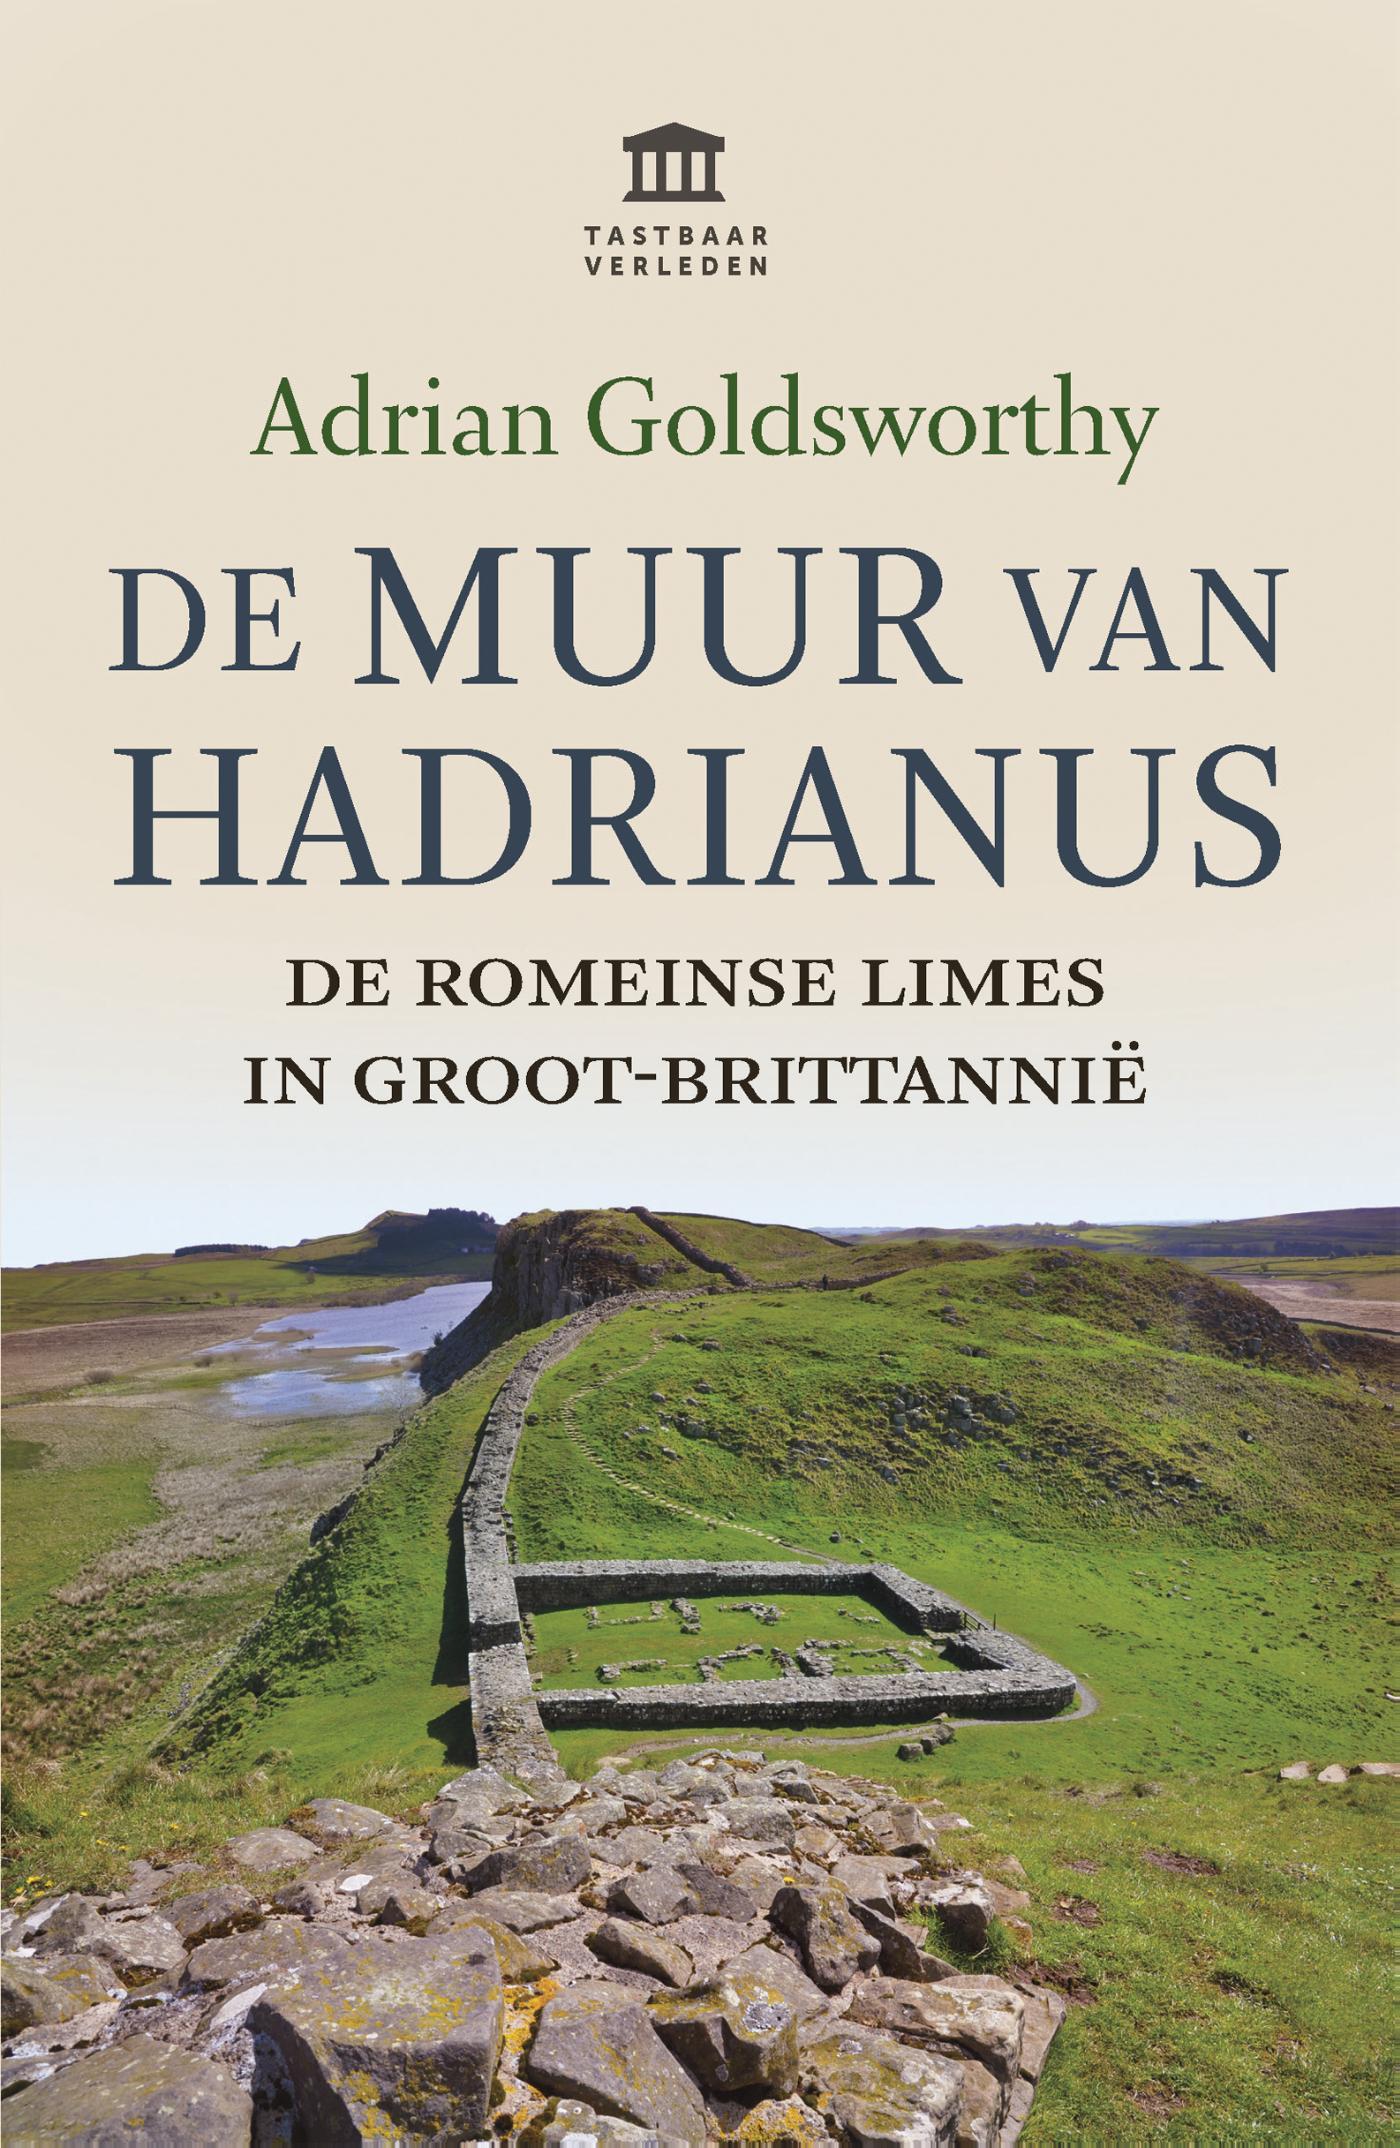 Reisverhaal De Muur van Hadrianus | Adrian Goldsworthy <br/>€ 18.99 <br/> <a href='https://www.dezwerver.nl/reisgidsen/?tt=1554_252853_241358_&r=https%3A%2F%2Fwww.dezwerver.nl%2Fr%2Feuropa%2Fengeland%2Foverig-noord-2%2Fc%2Fboeken%2Freisverhalen%2F9789401912440%2Freisverhaal-de-muur-van-hadrianus-adrian-goldsworthy%2F' target='_blank'>Meer Info</a>